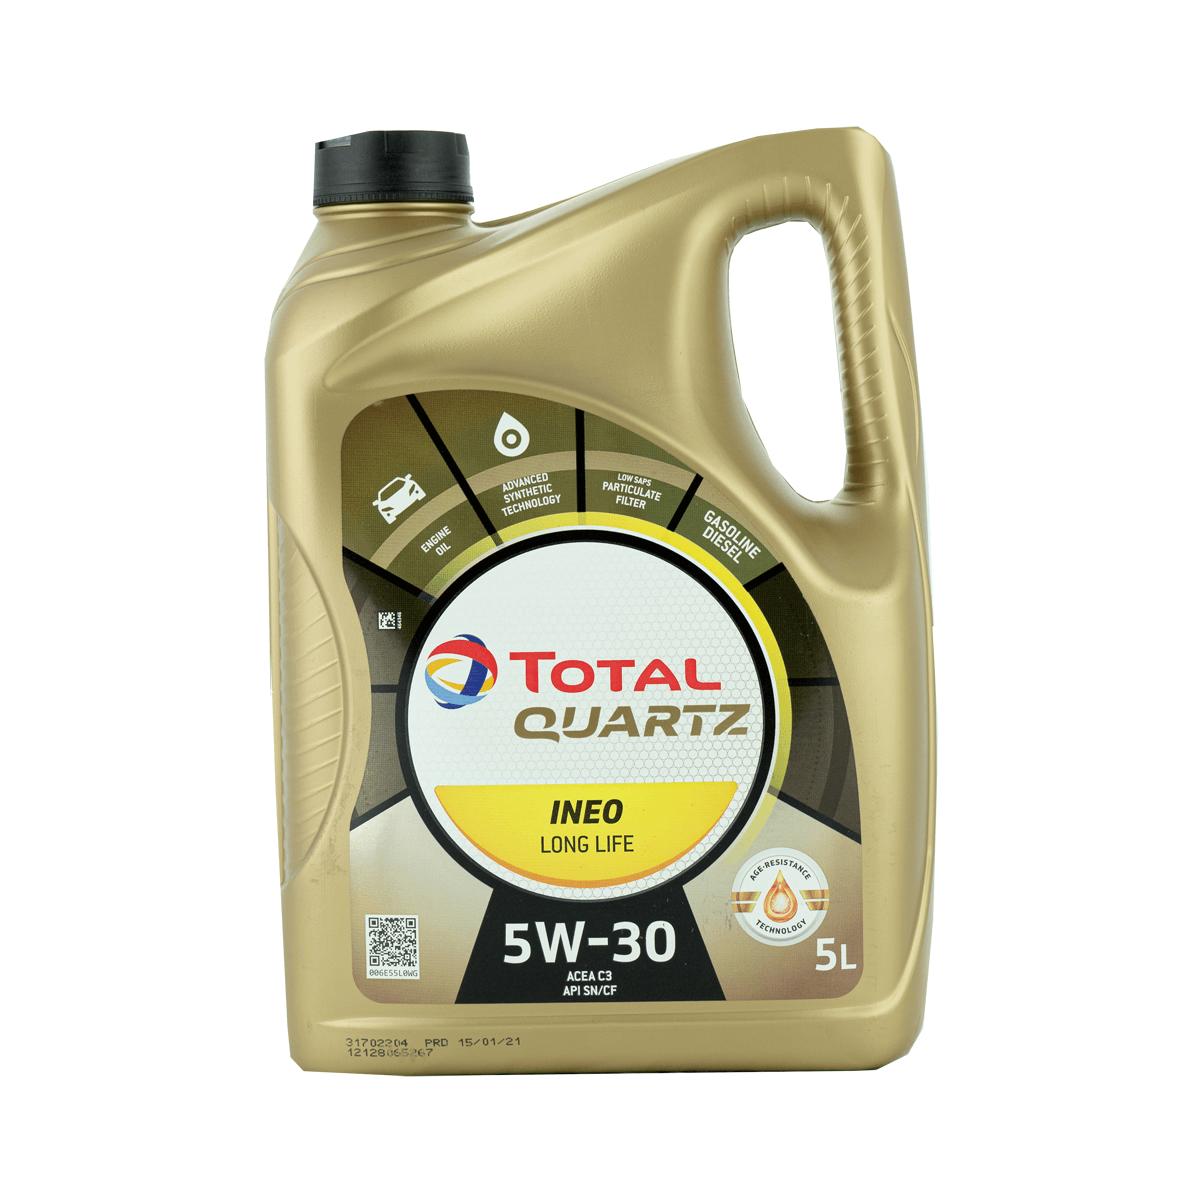 Total Quartz INEO LONG LIFE 5W-30 Motoröl, 5l